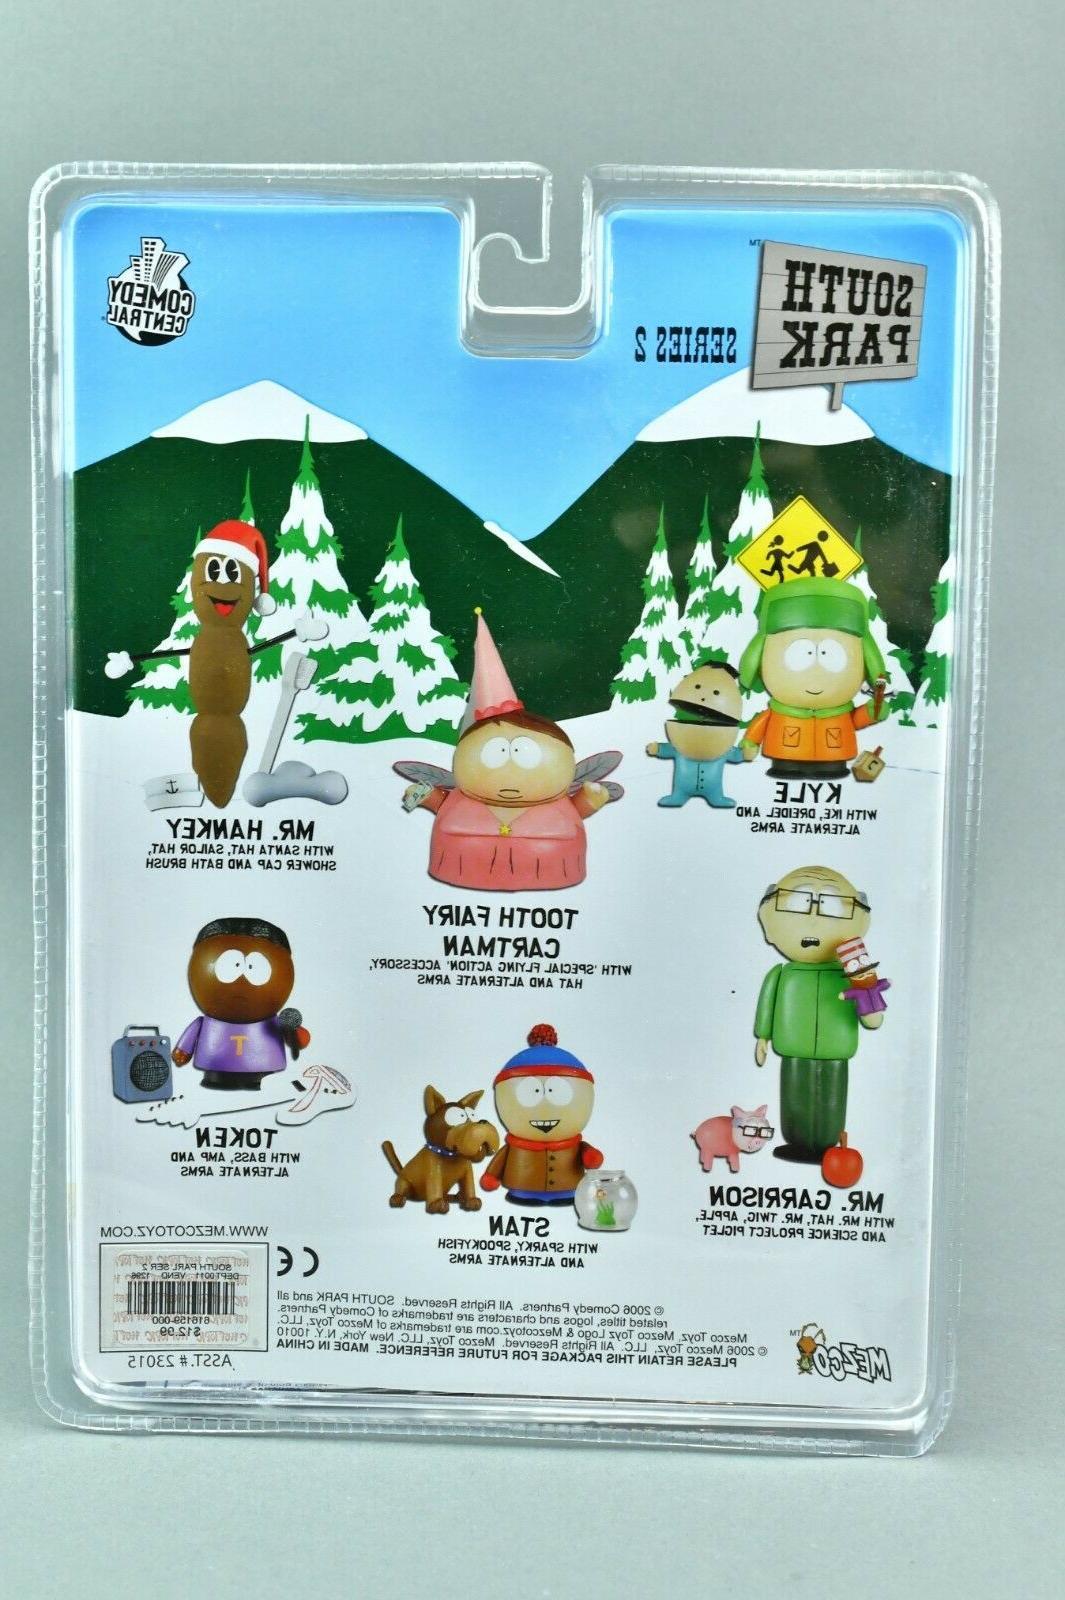 South Park Hankey Series 2 Figure MOSC